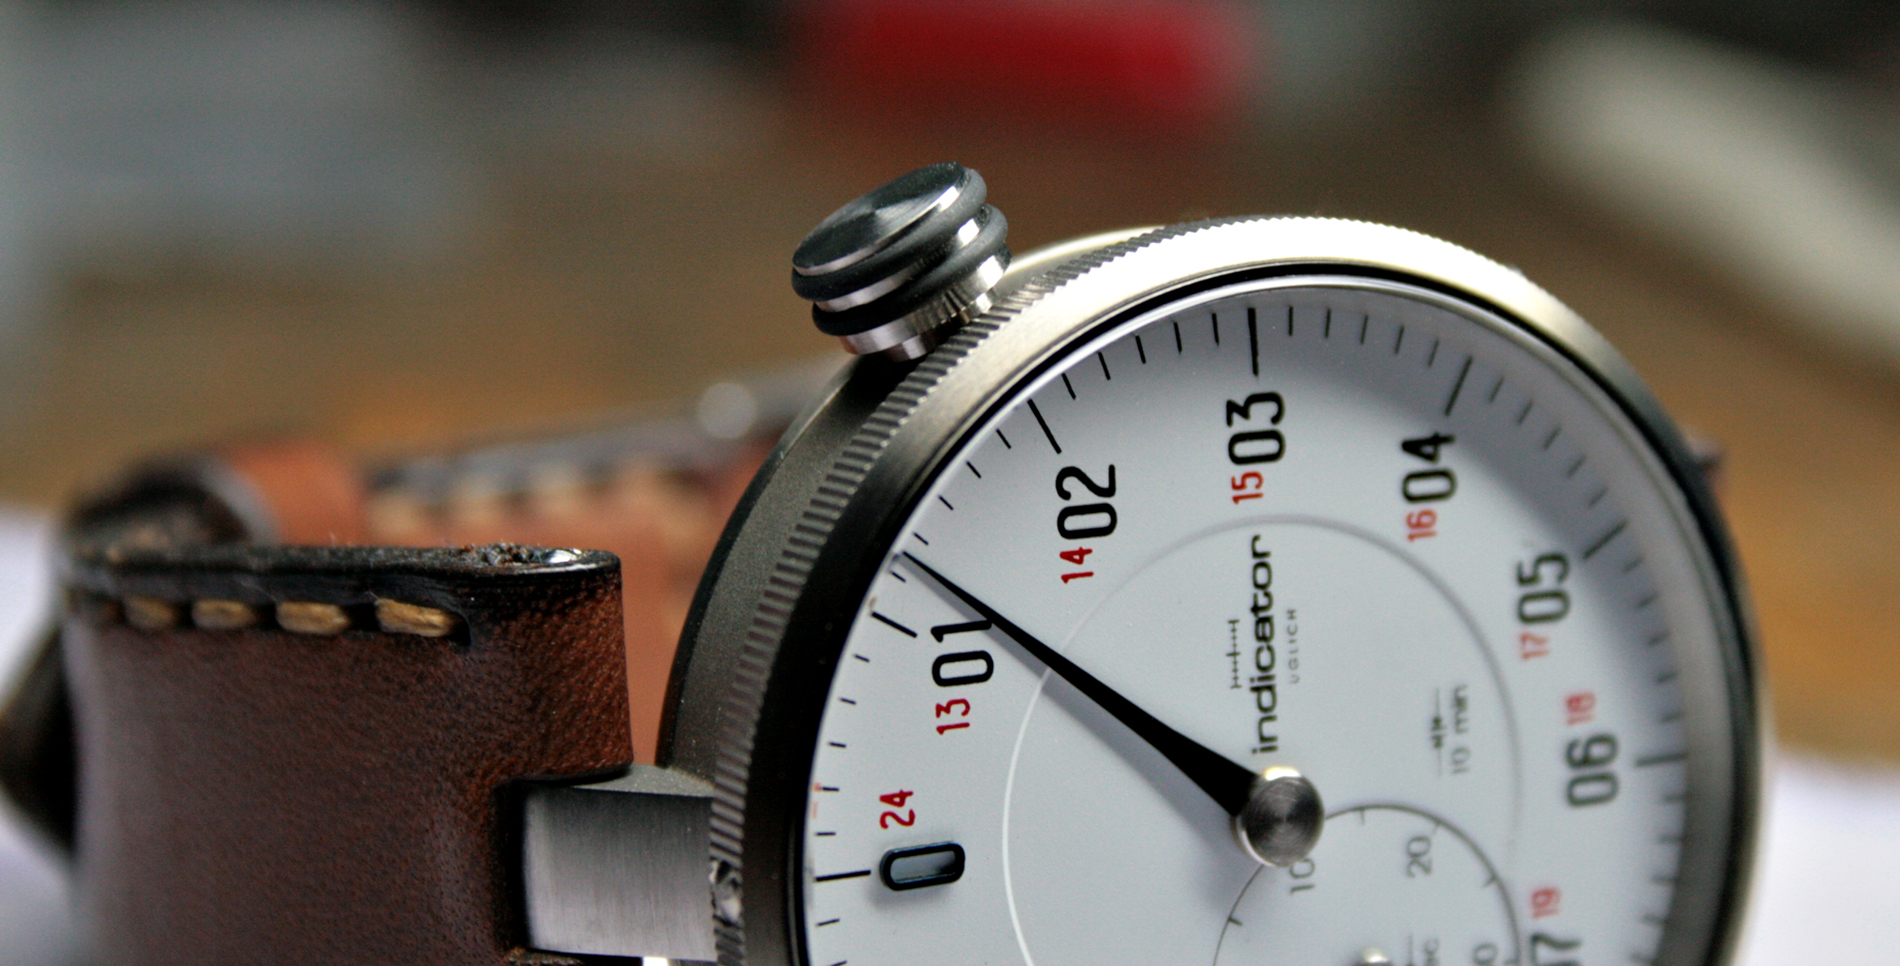 New RUSSIAN time tool INDICATOR-img_7584.jpg